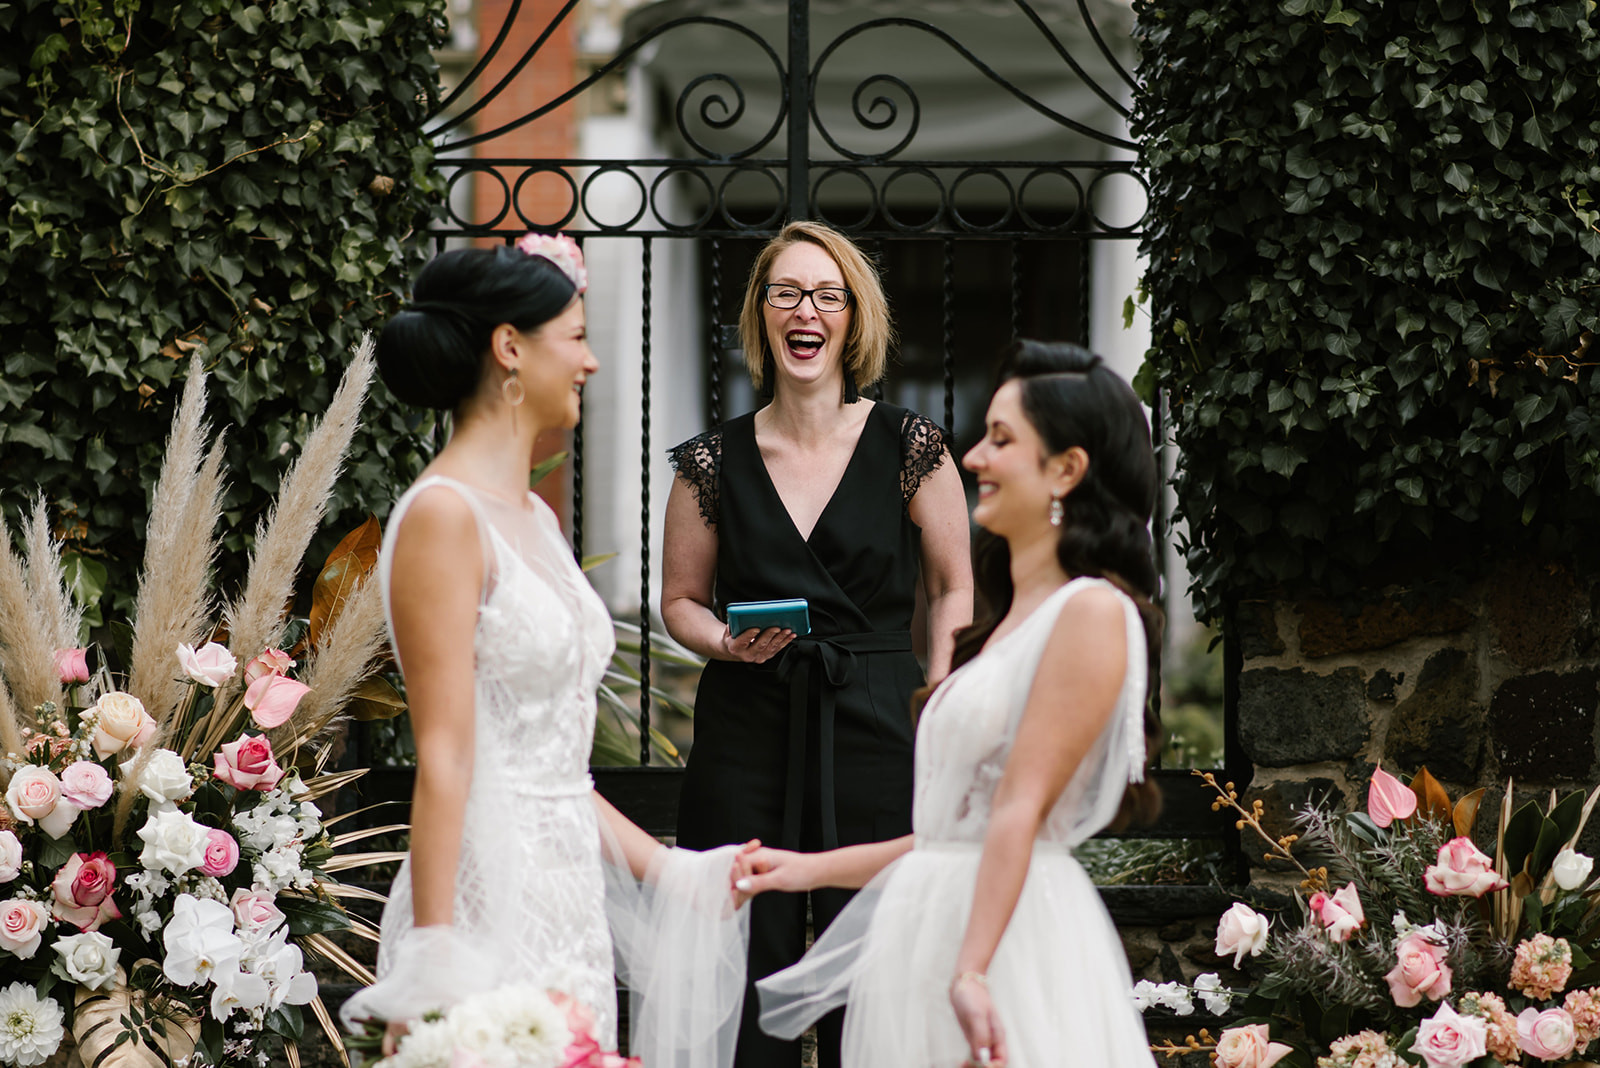 Fun wedding celebrant